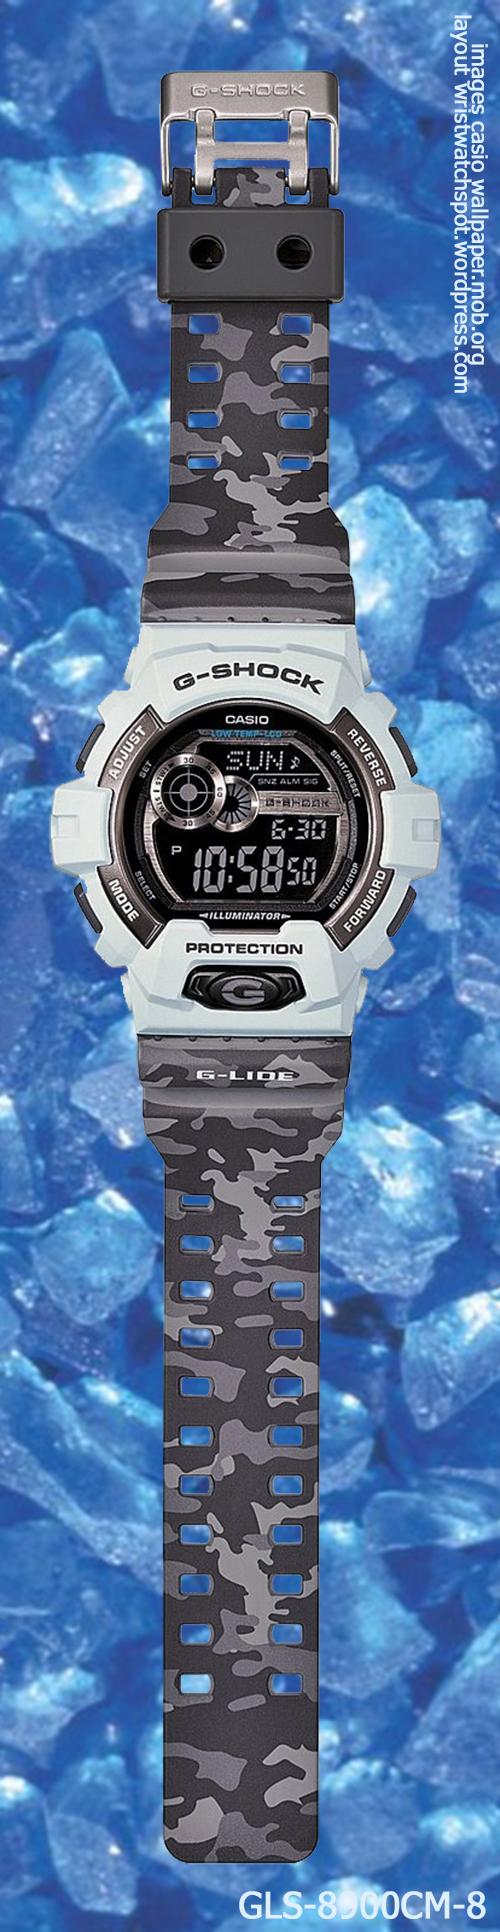 g-shock_gls-8900cm-8_front g-lide watch 2014 camouflage